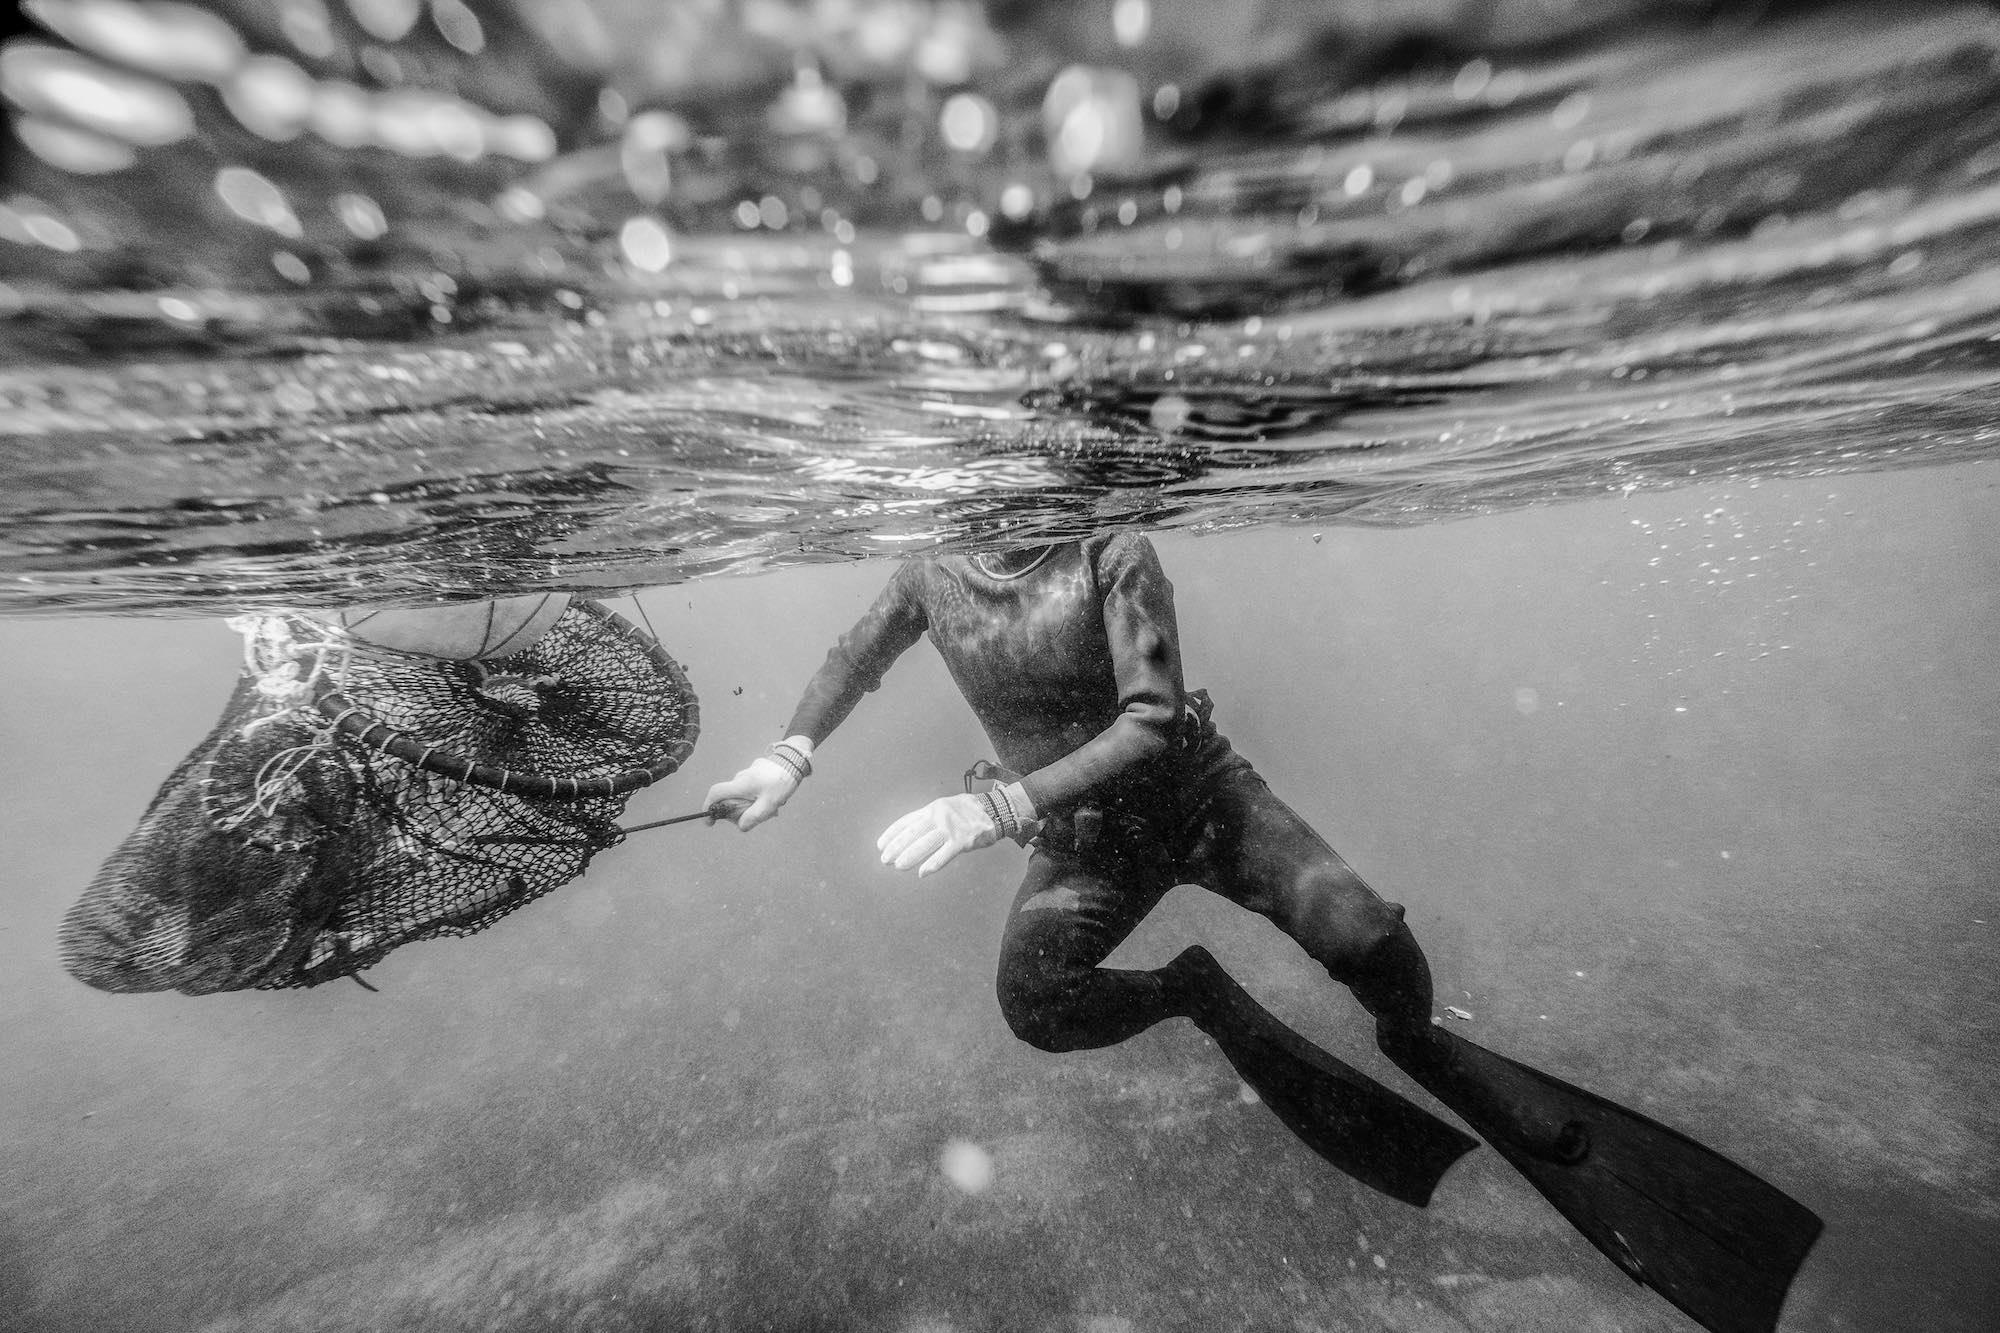 Underwater Photography Haenyeo Jeju FUJIFILM XT2 Singapore Jose Jeuland COCO Creative Studio6